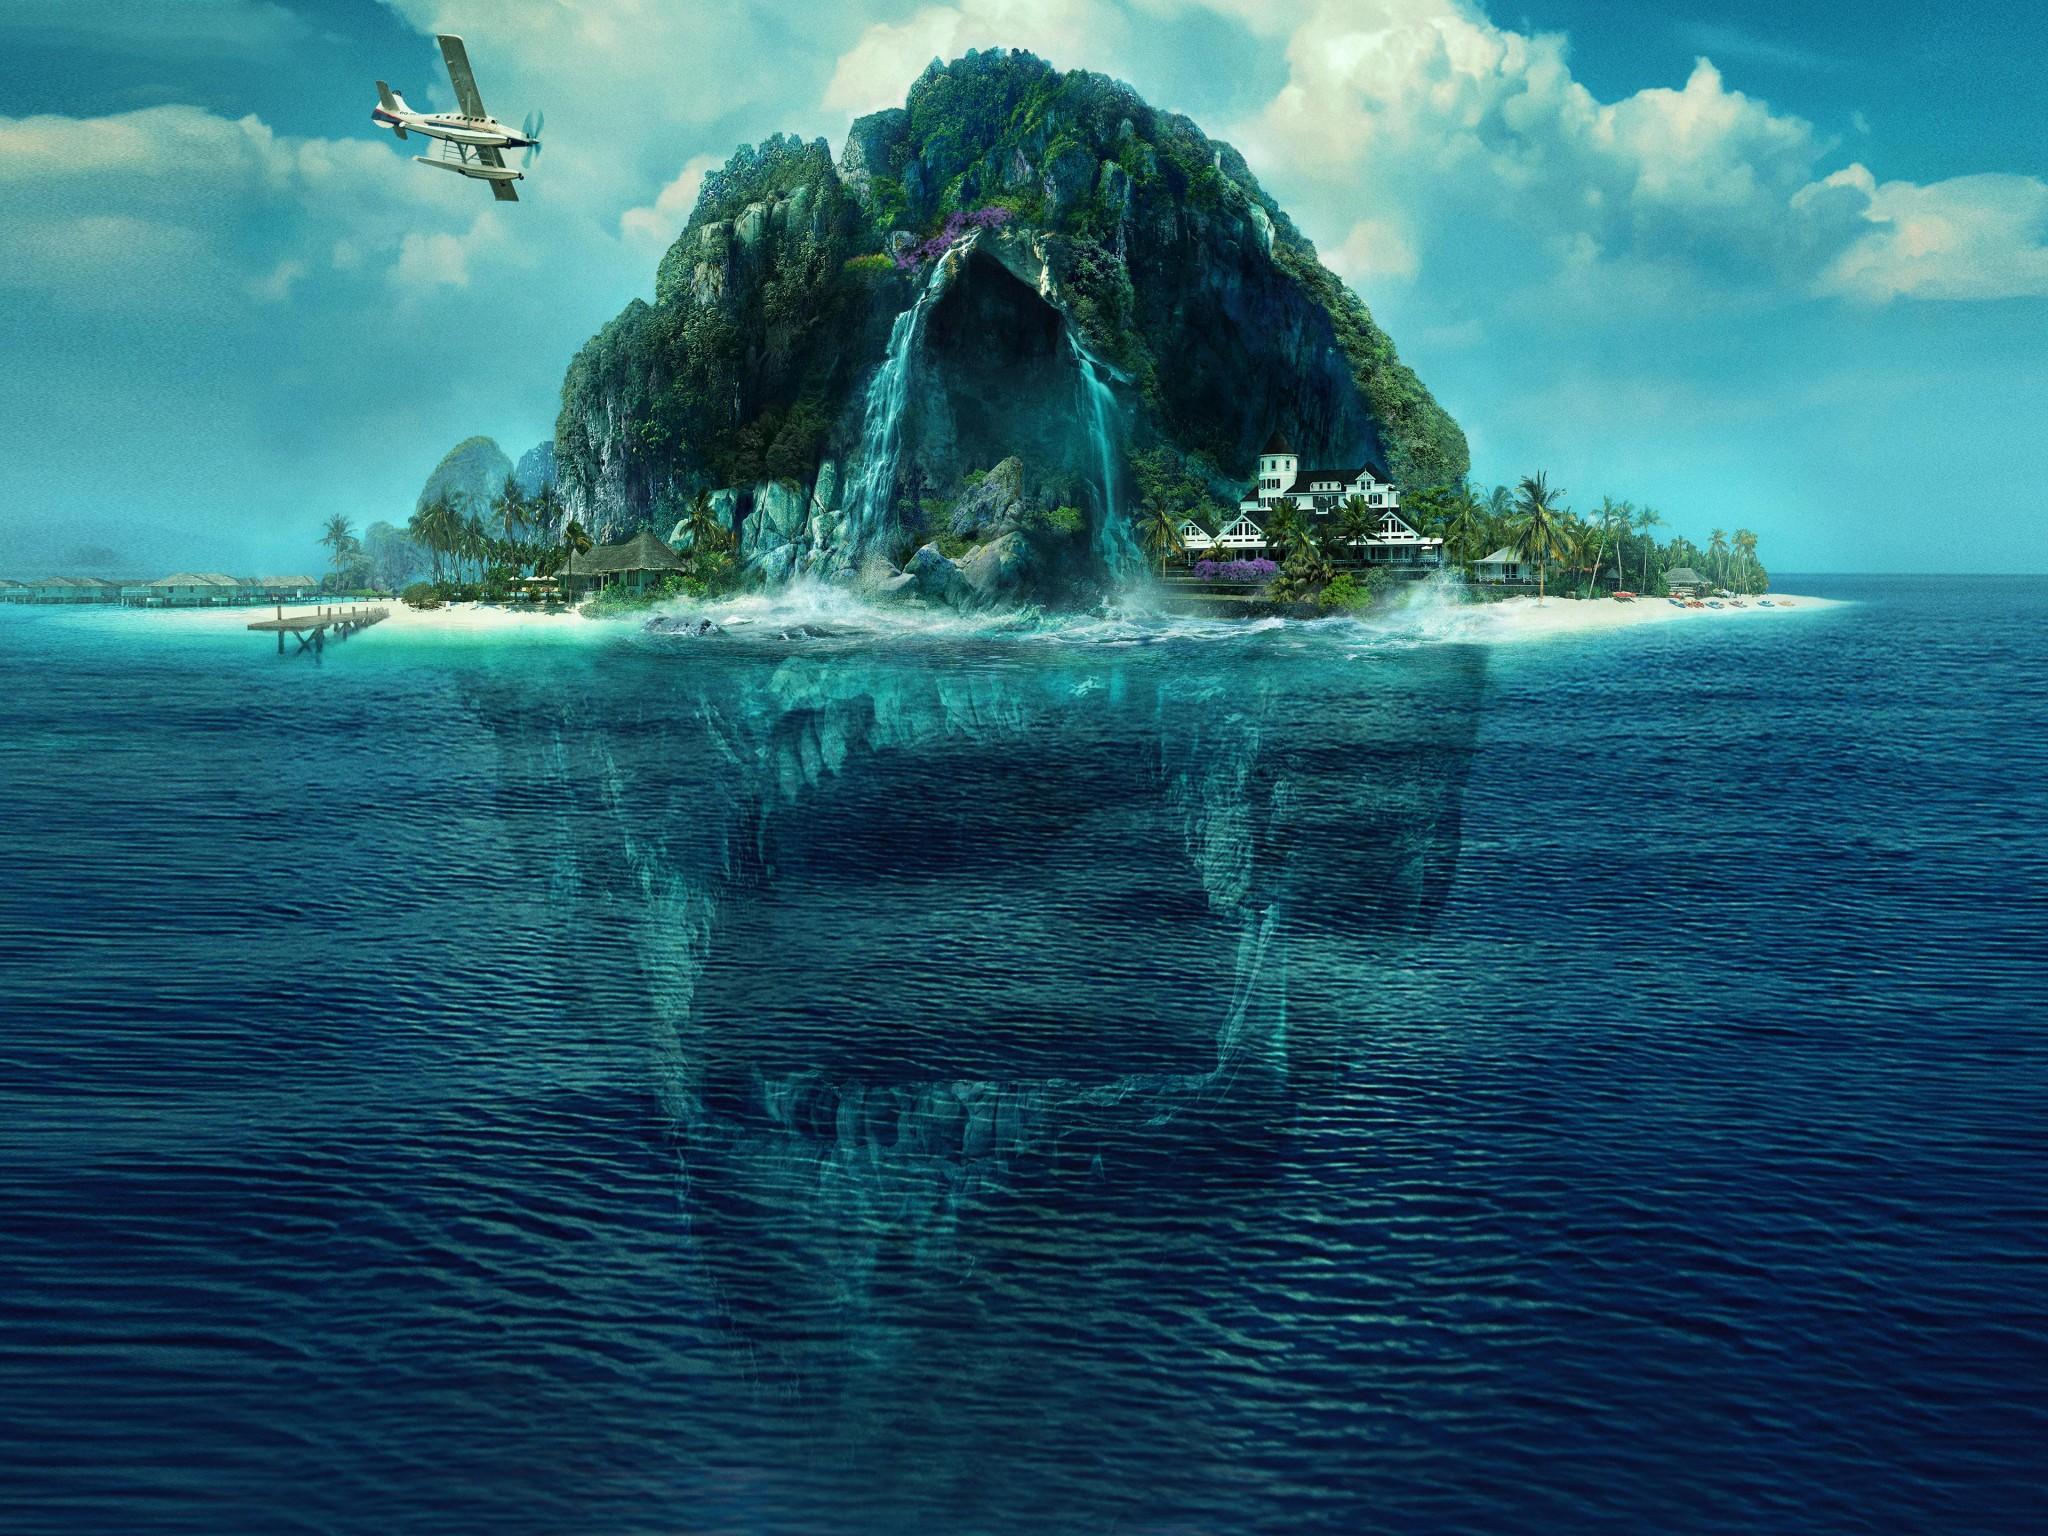 Fantasy Island 2020 4K 5K HD desktop wallpaper Widescreen High 2048x1536